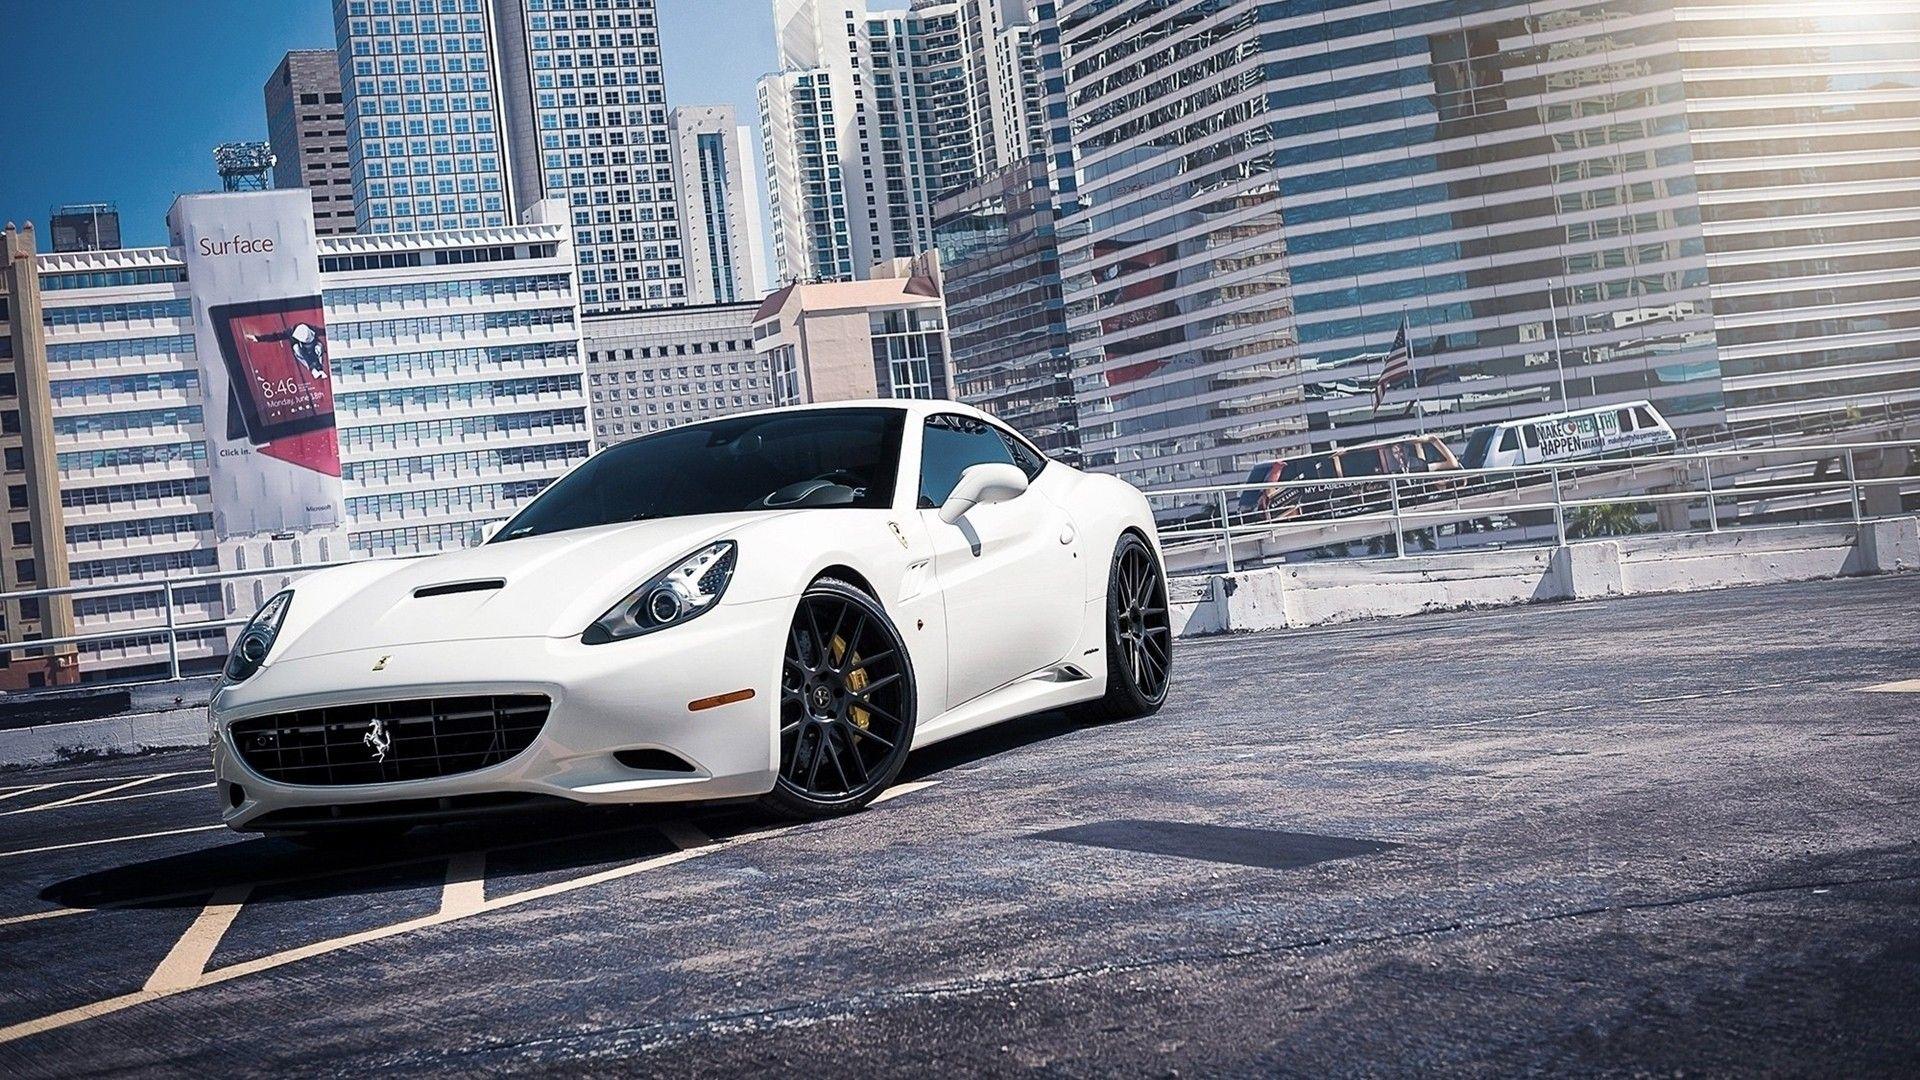 White ferrari california v12 1080p hd wallpaper car cool white ferrari california v12 1080p hd wallpaper car voltagebd Gallery